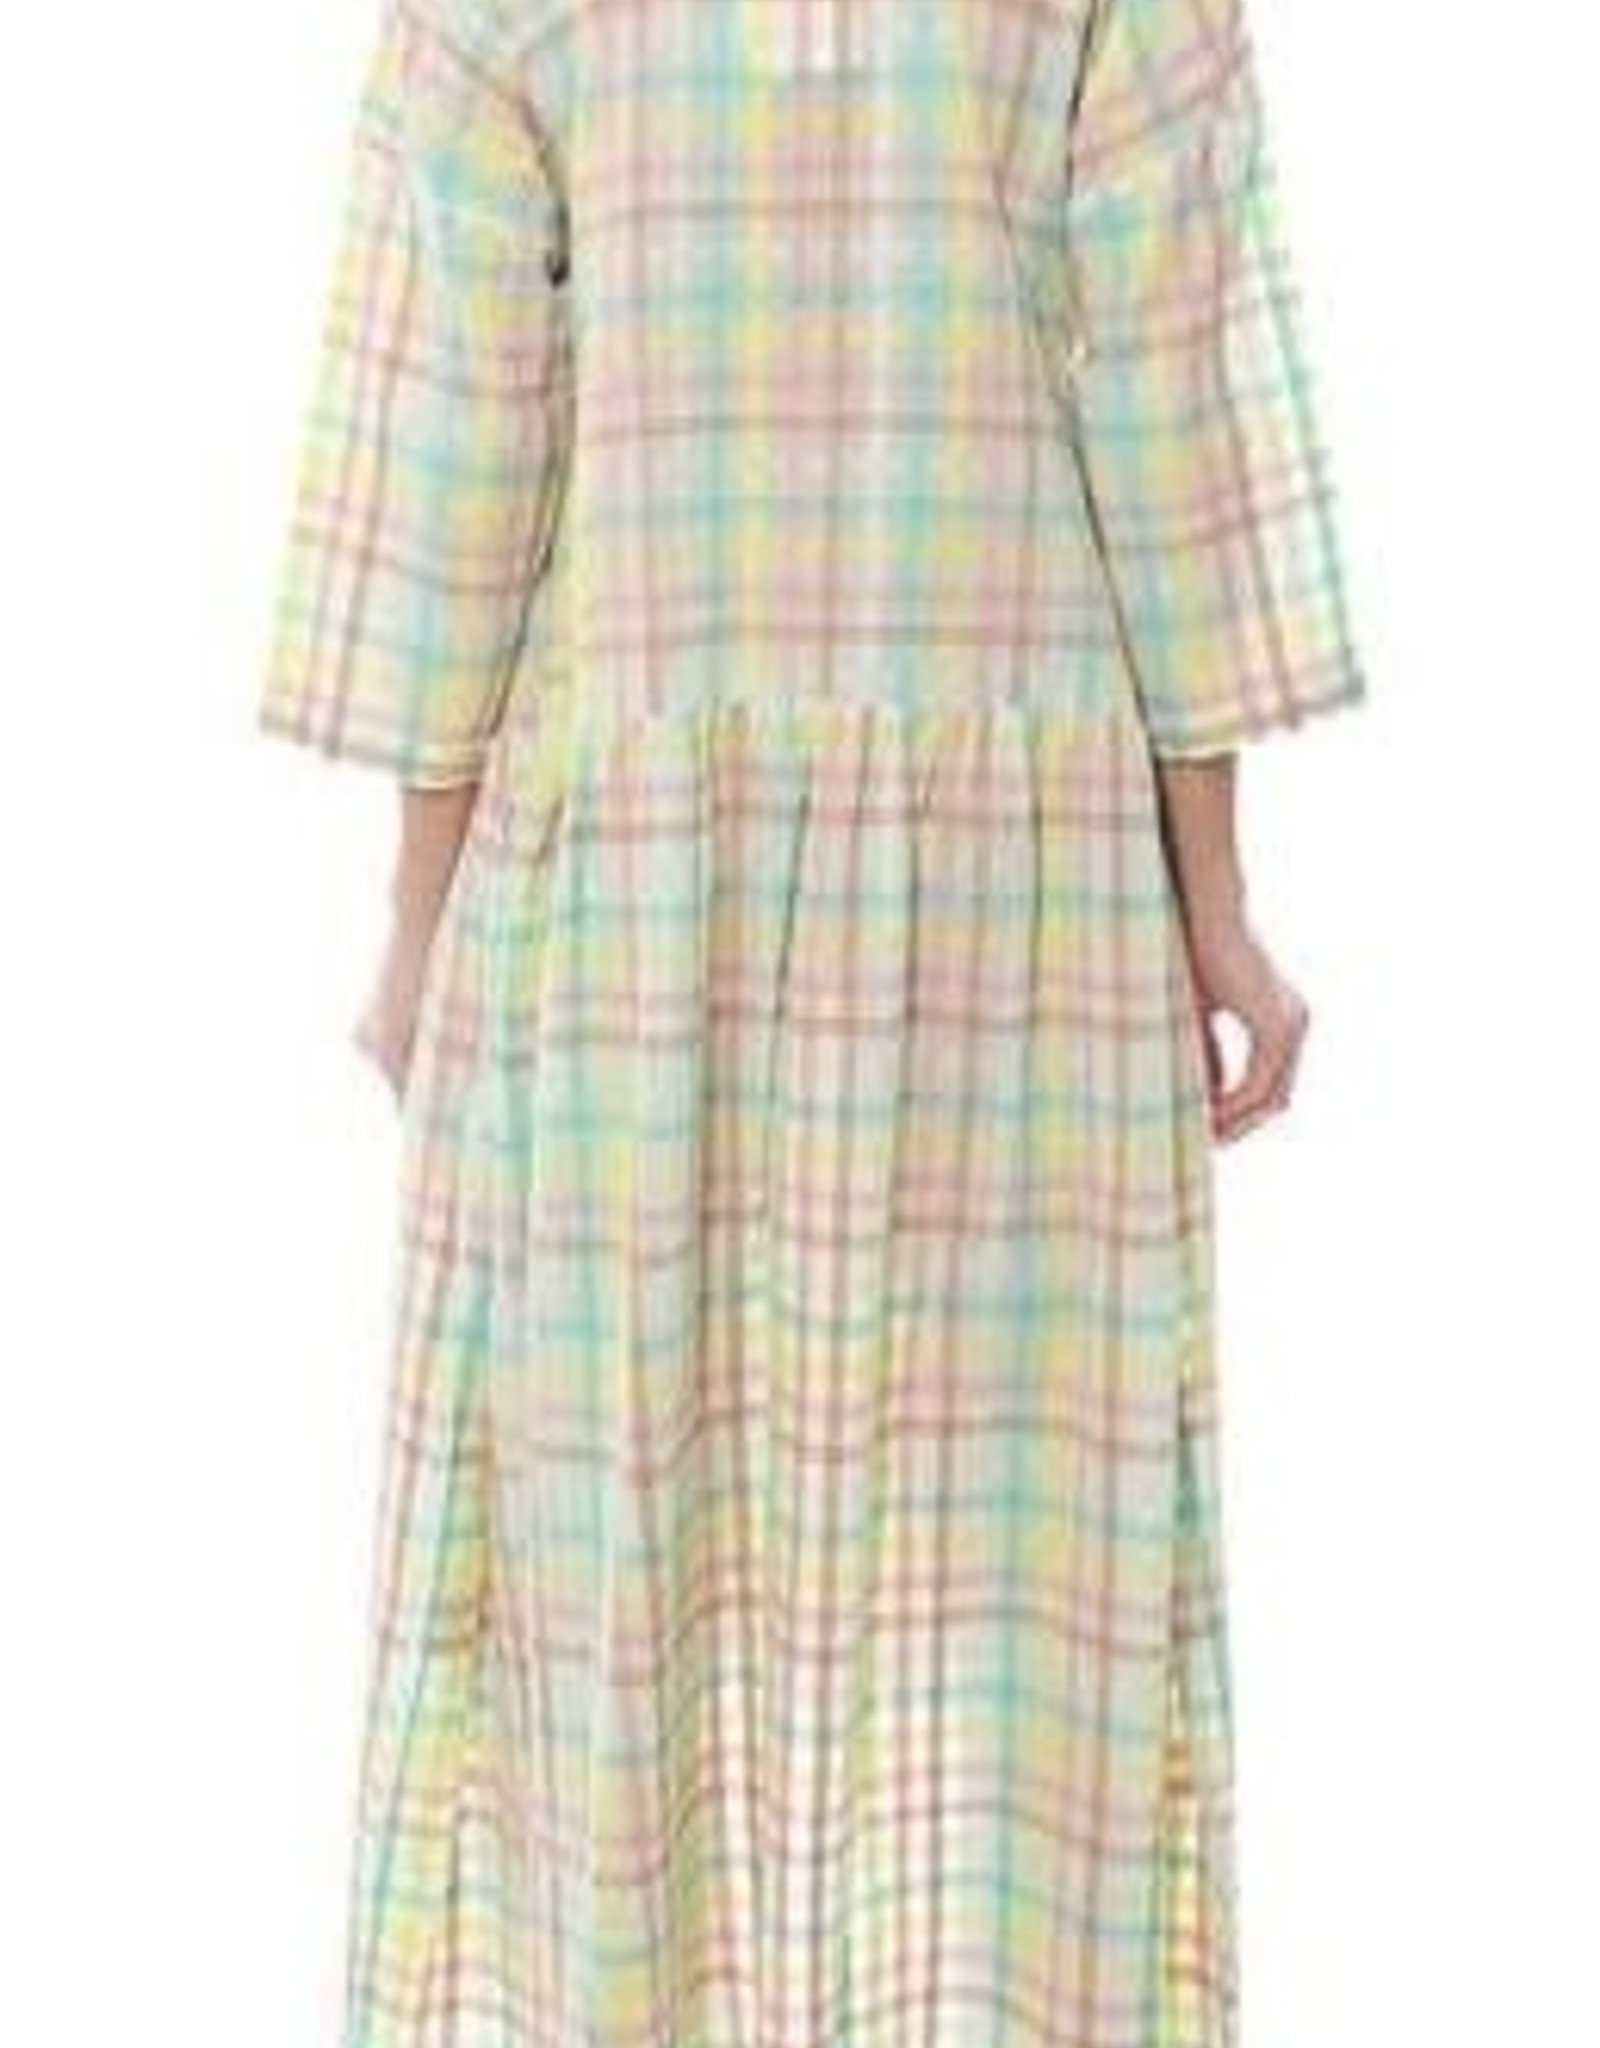 MII - Plaid Pastel Dress